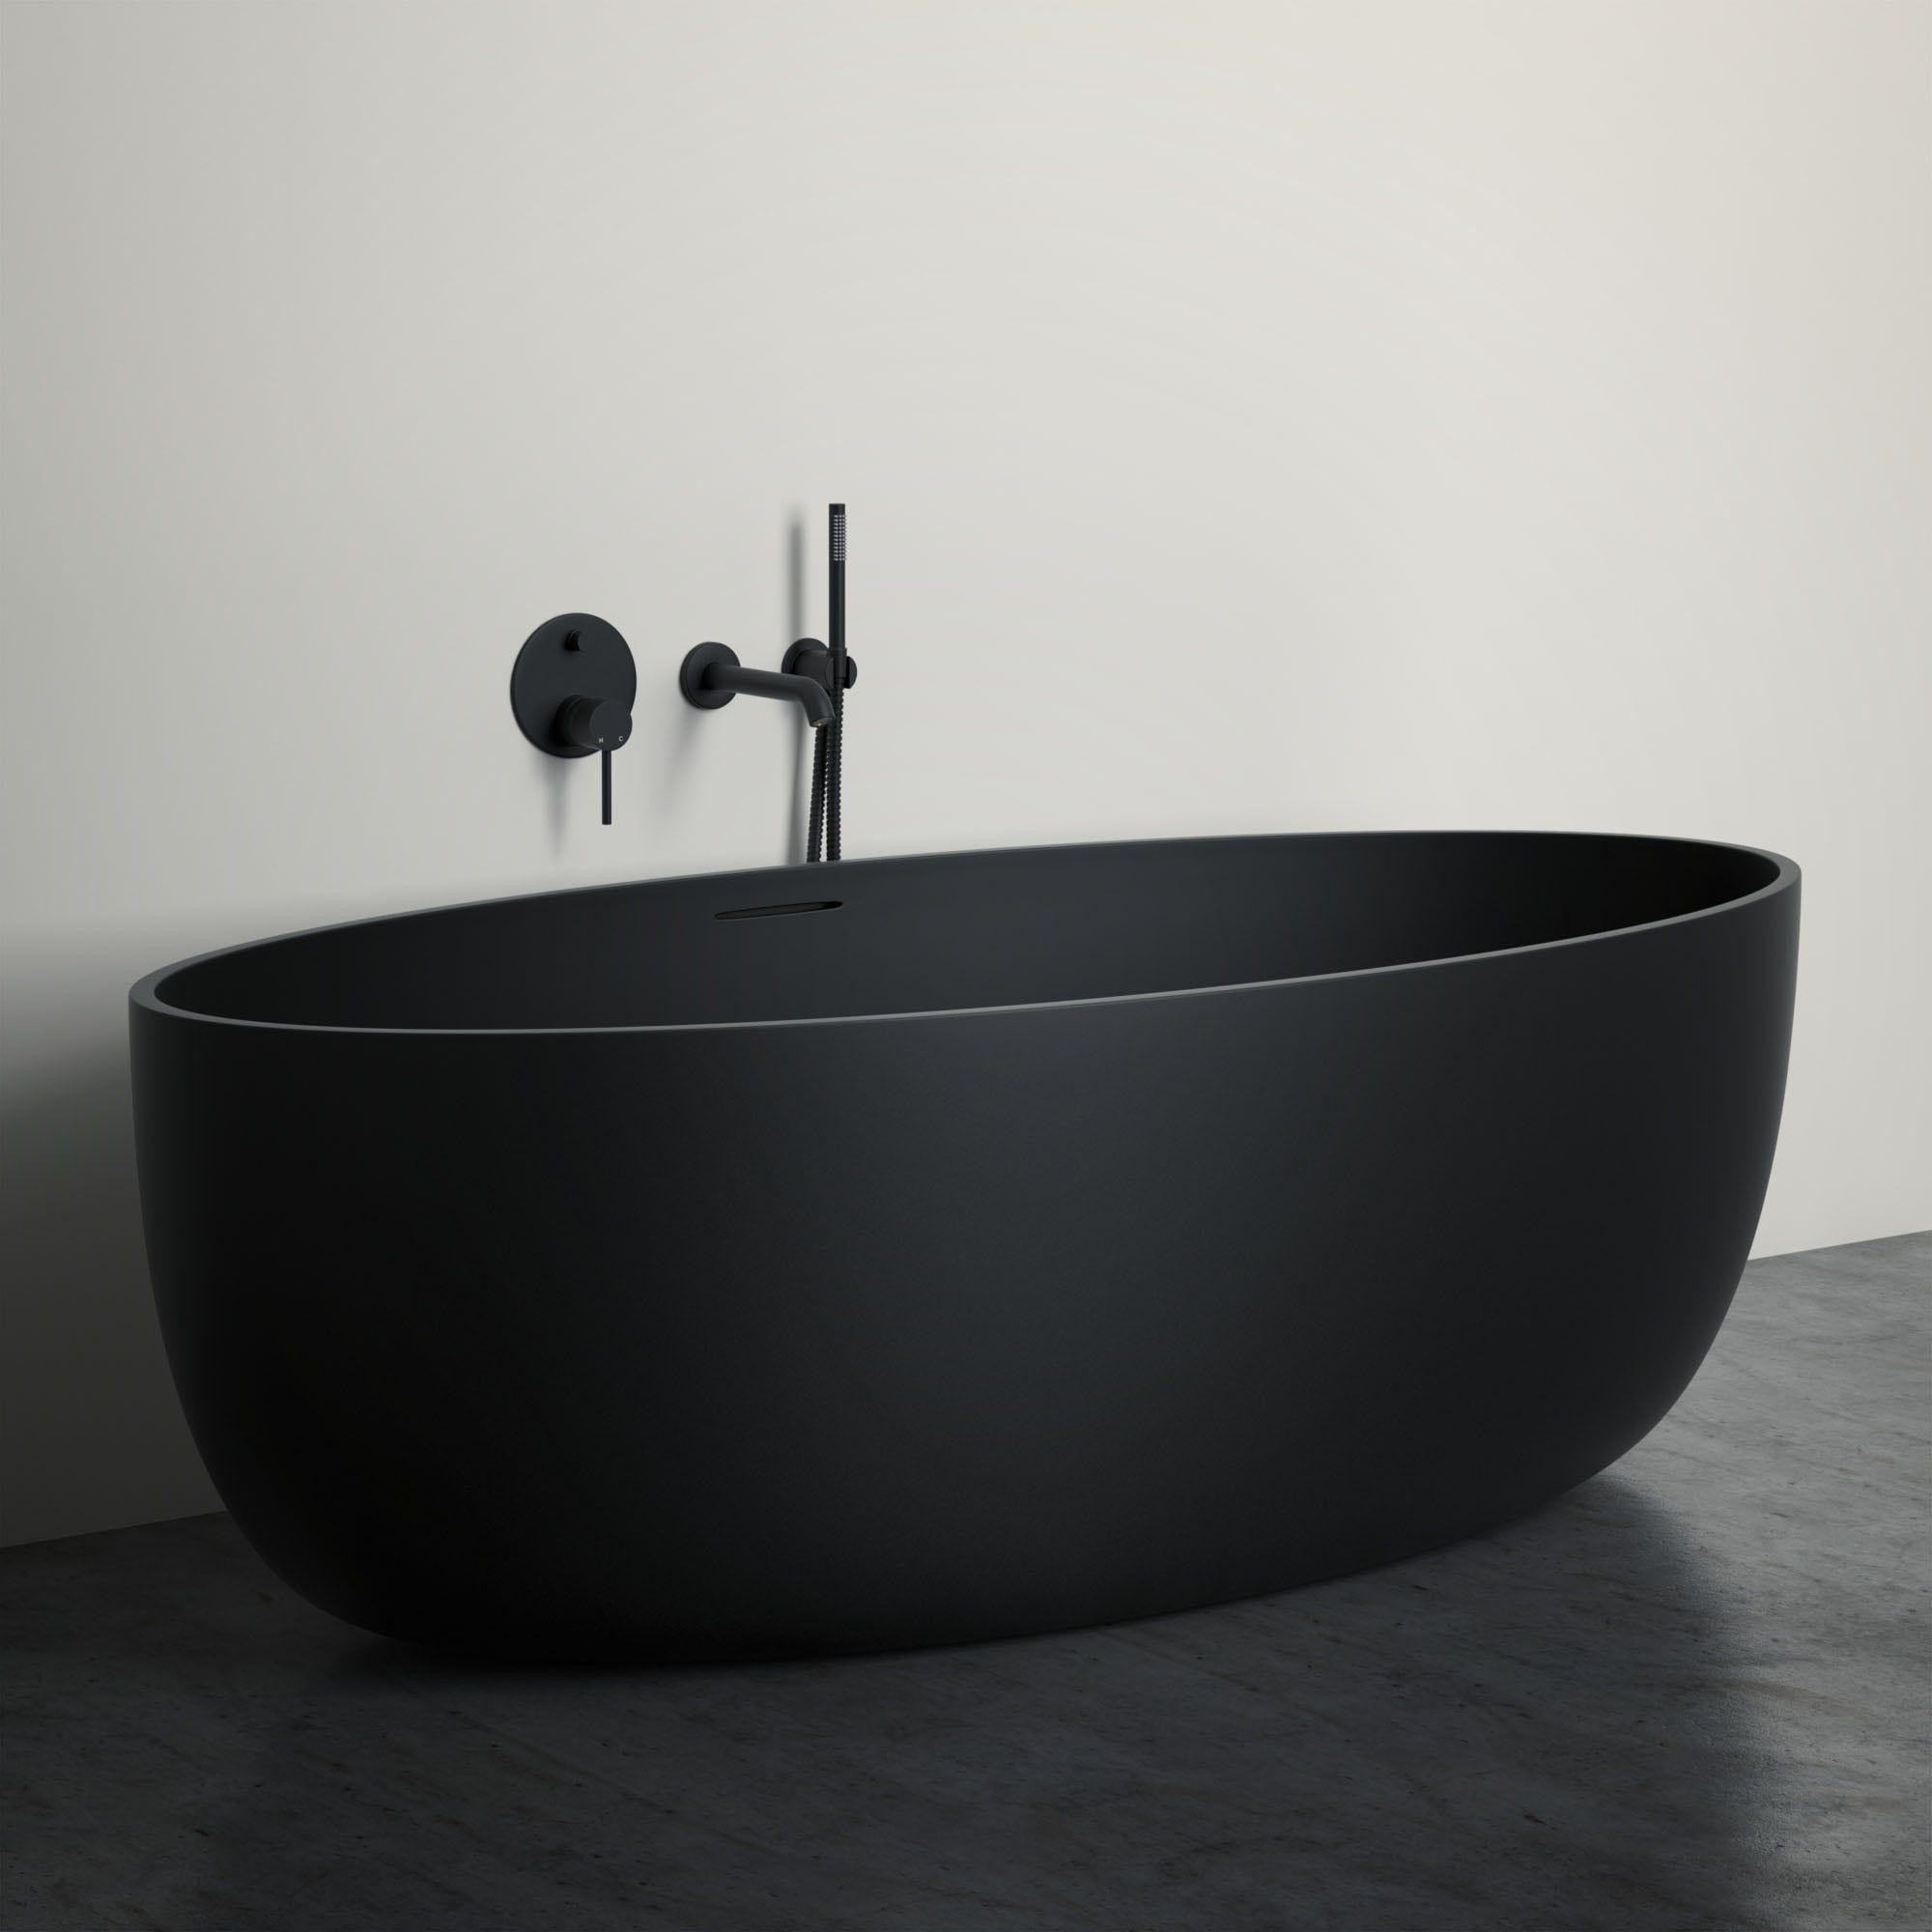 Lusso Stone Vetrina Black Stone Resin Solid Surface Freestanding Bath 1700 Mit Bildern Badezimmer Schwarz Badezimmer Wasserhahn Badezimmer